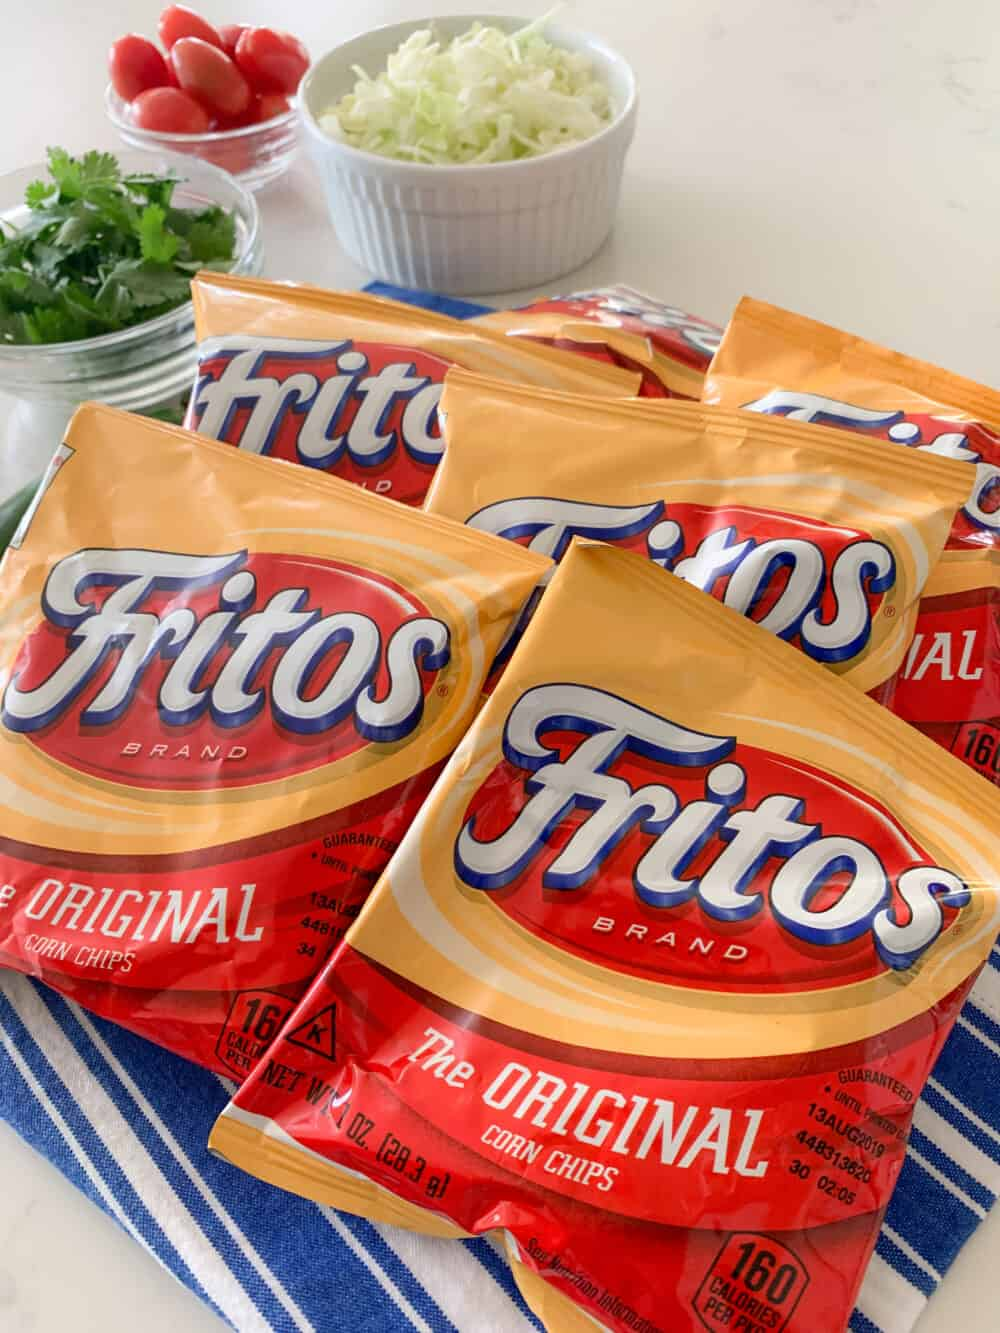 frito bags for walking tacos